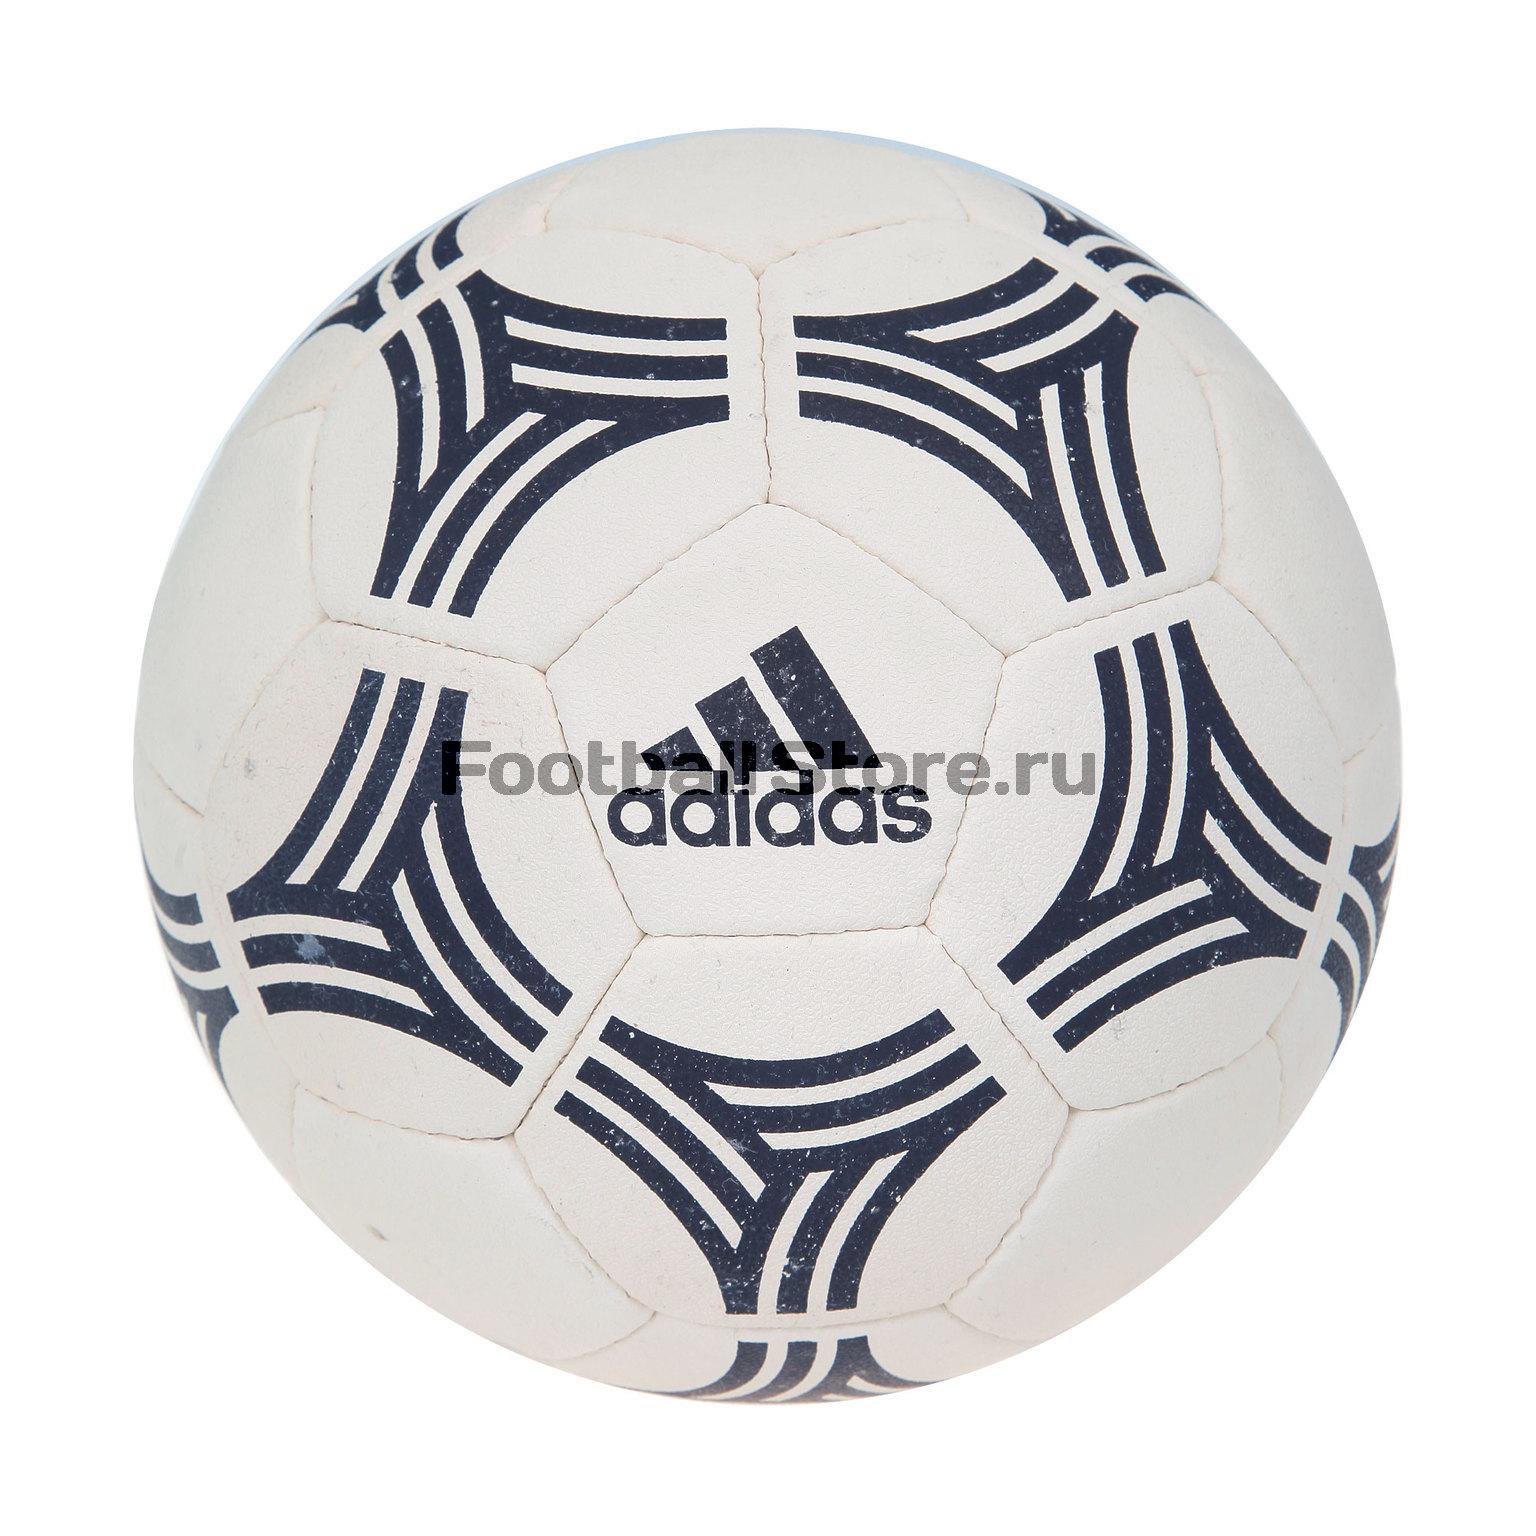 Adidas Мяч Adidas Tango Sala AZ5192 adidas мяч adidas offpitch sala ao3271